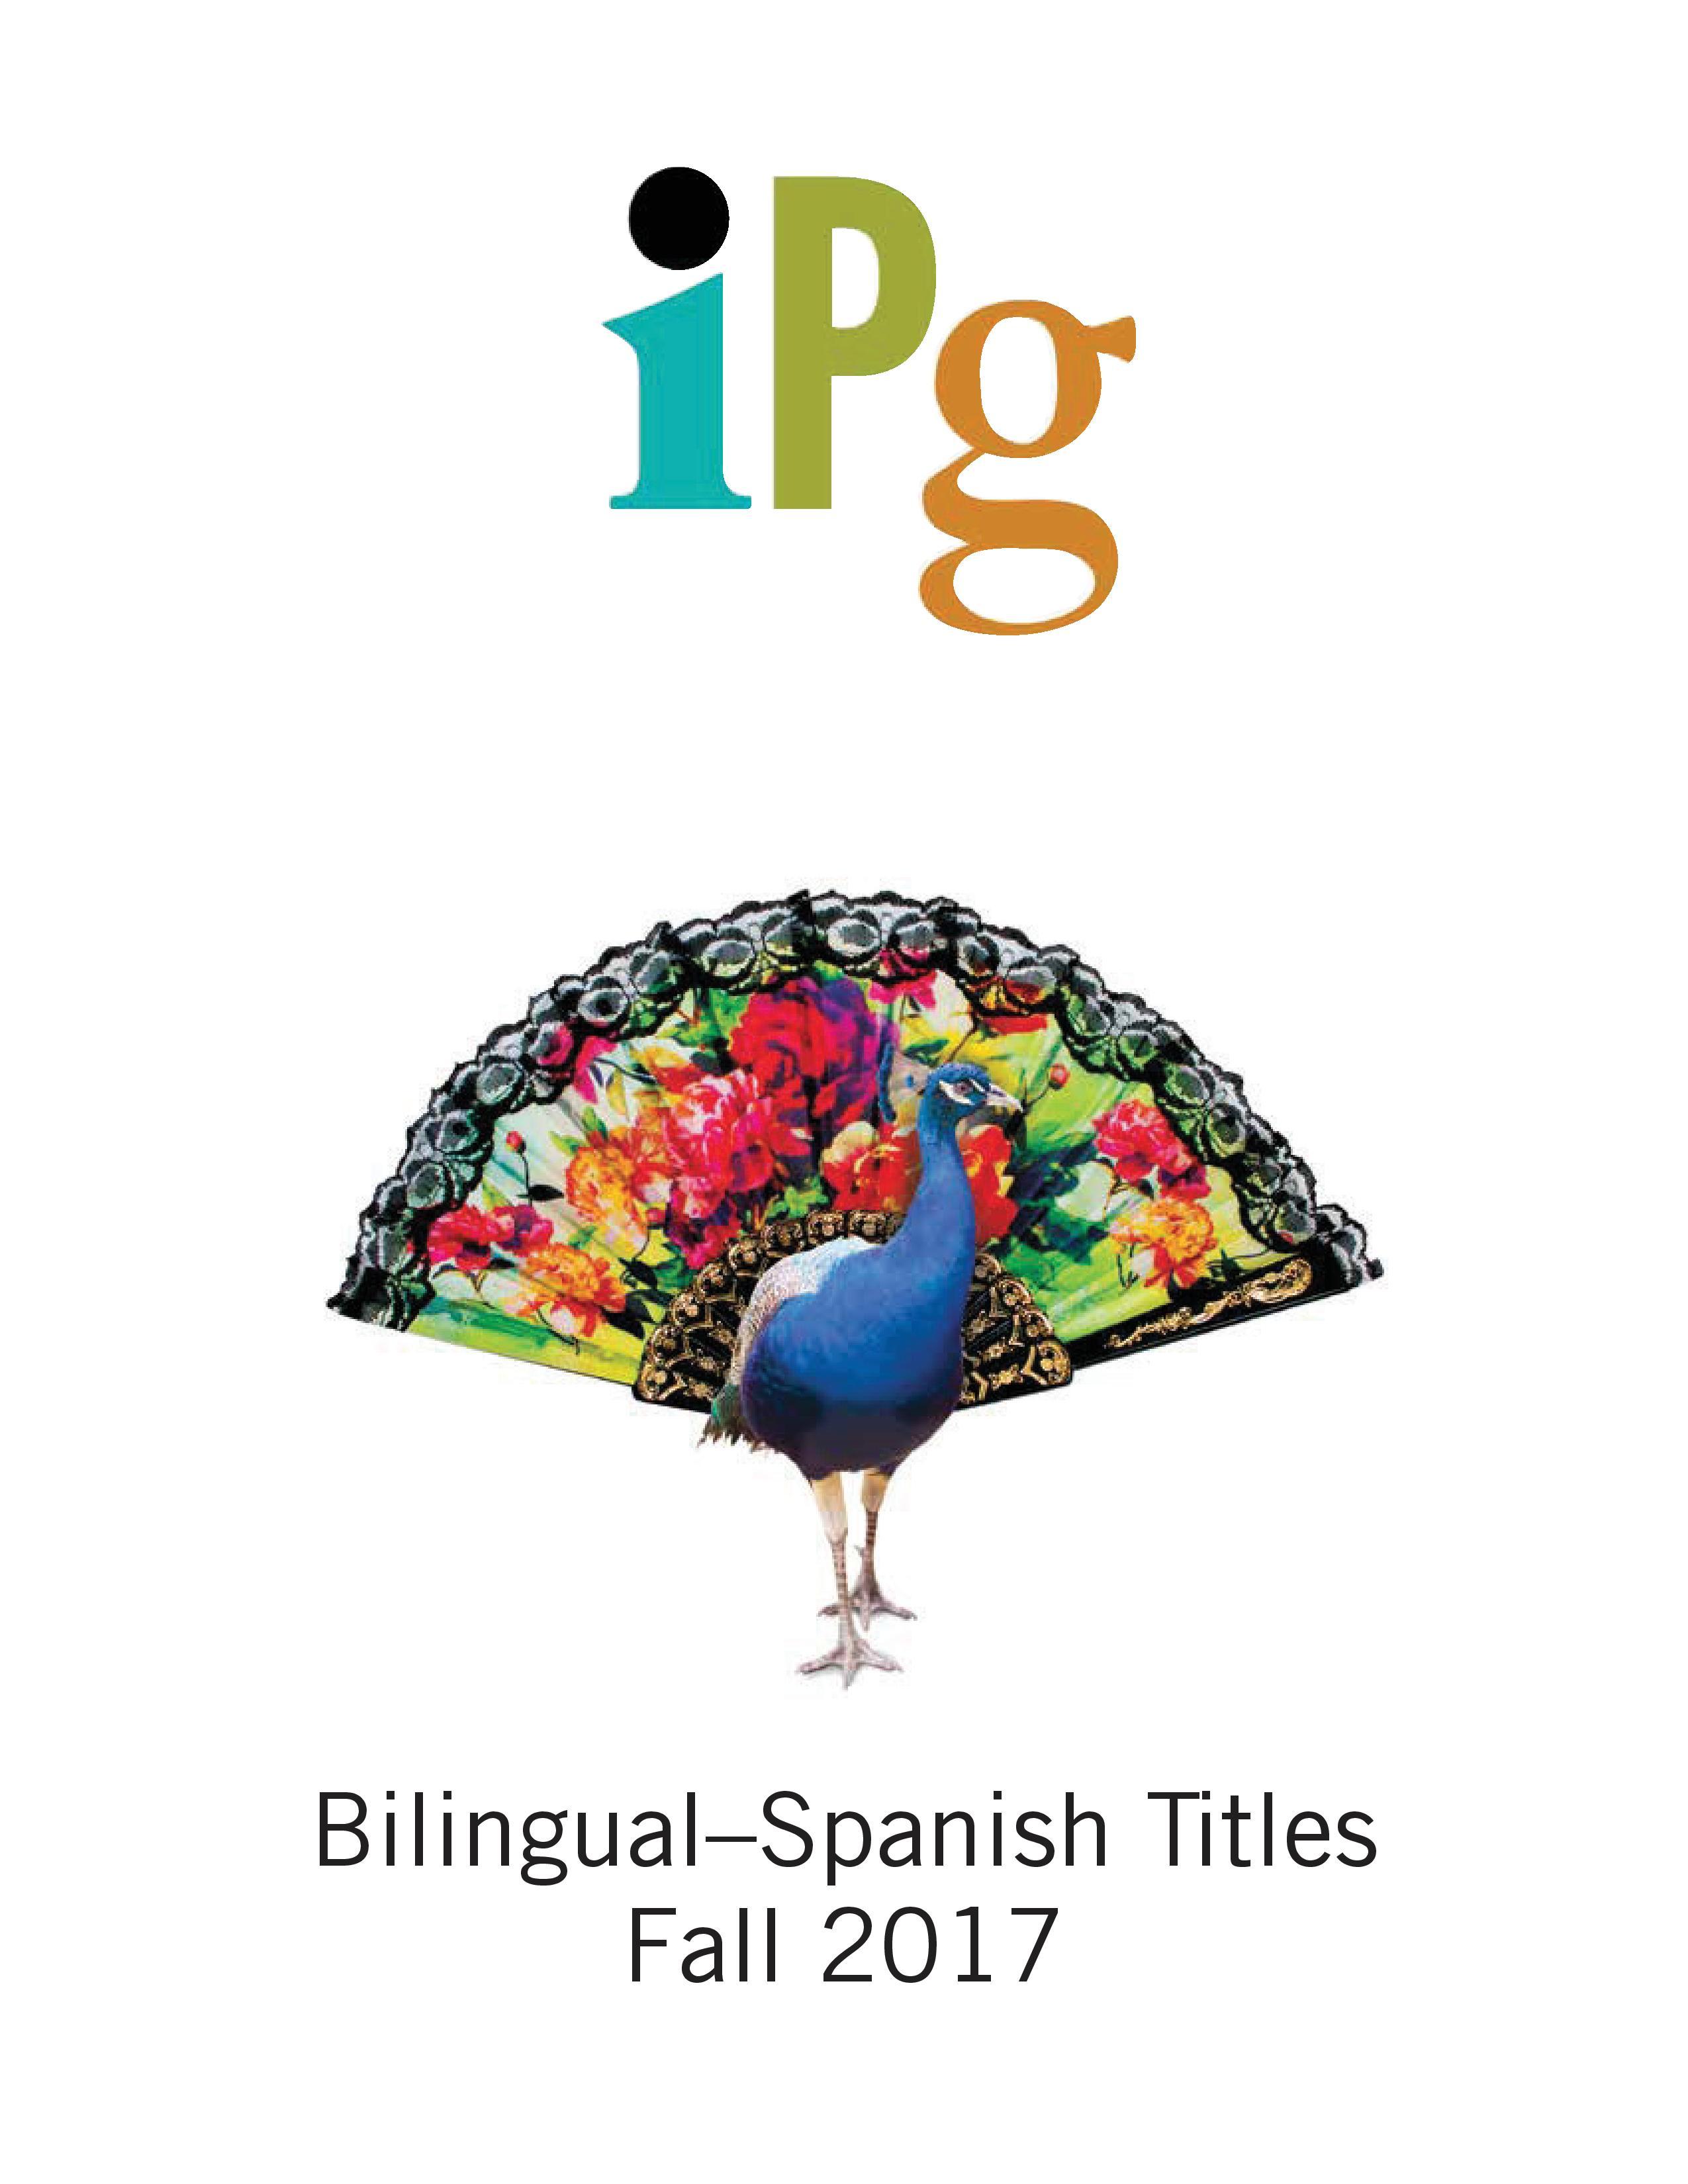 Bilingual Spanish Titles